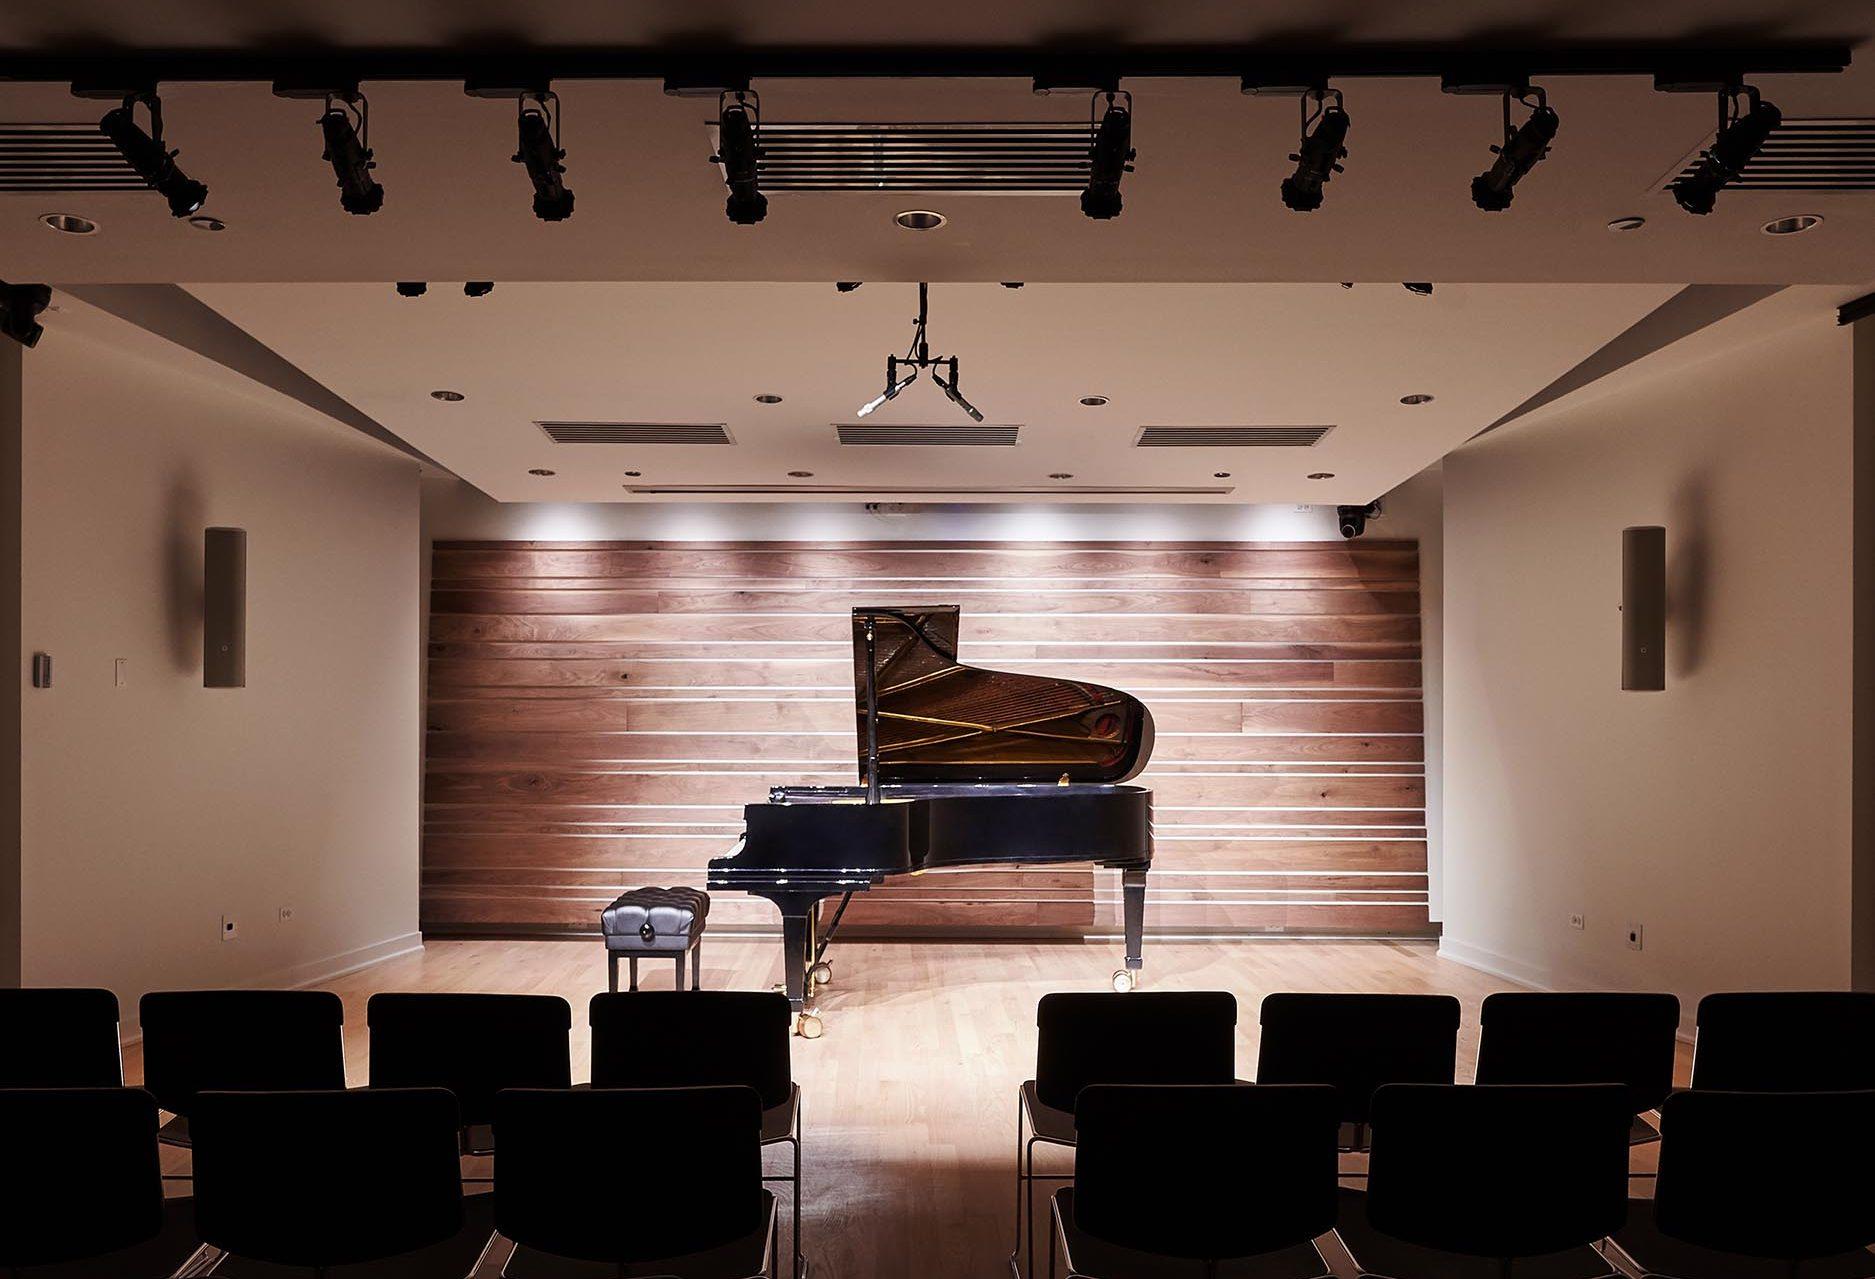 Guarneri Hall performance space